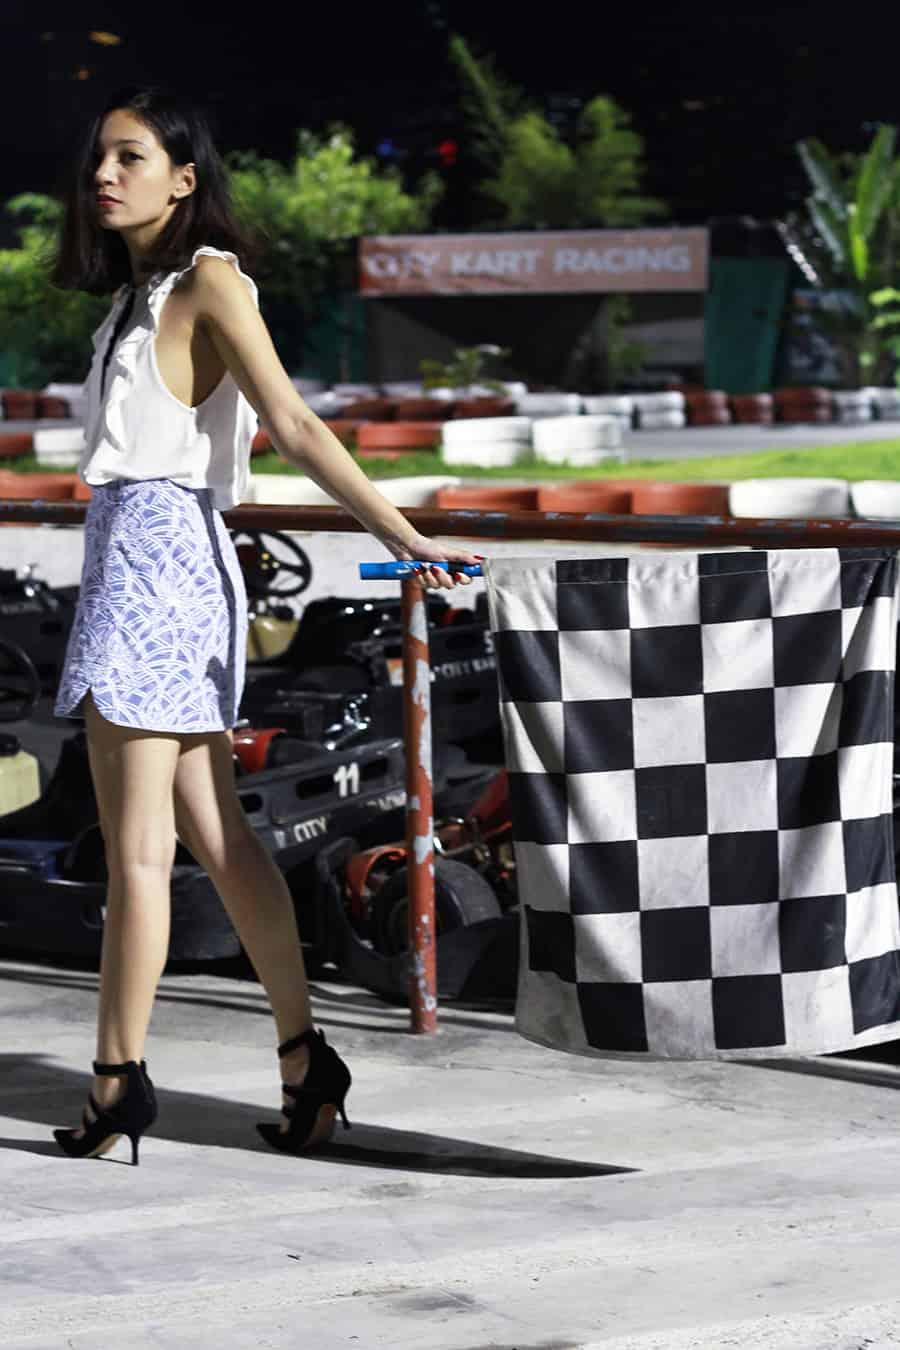 city-kart-racing